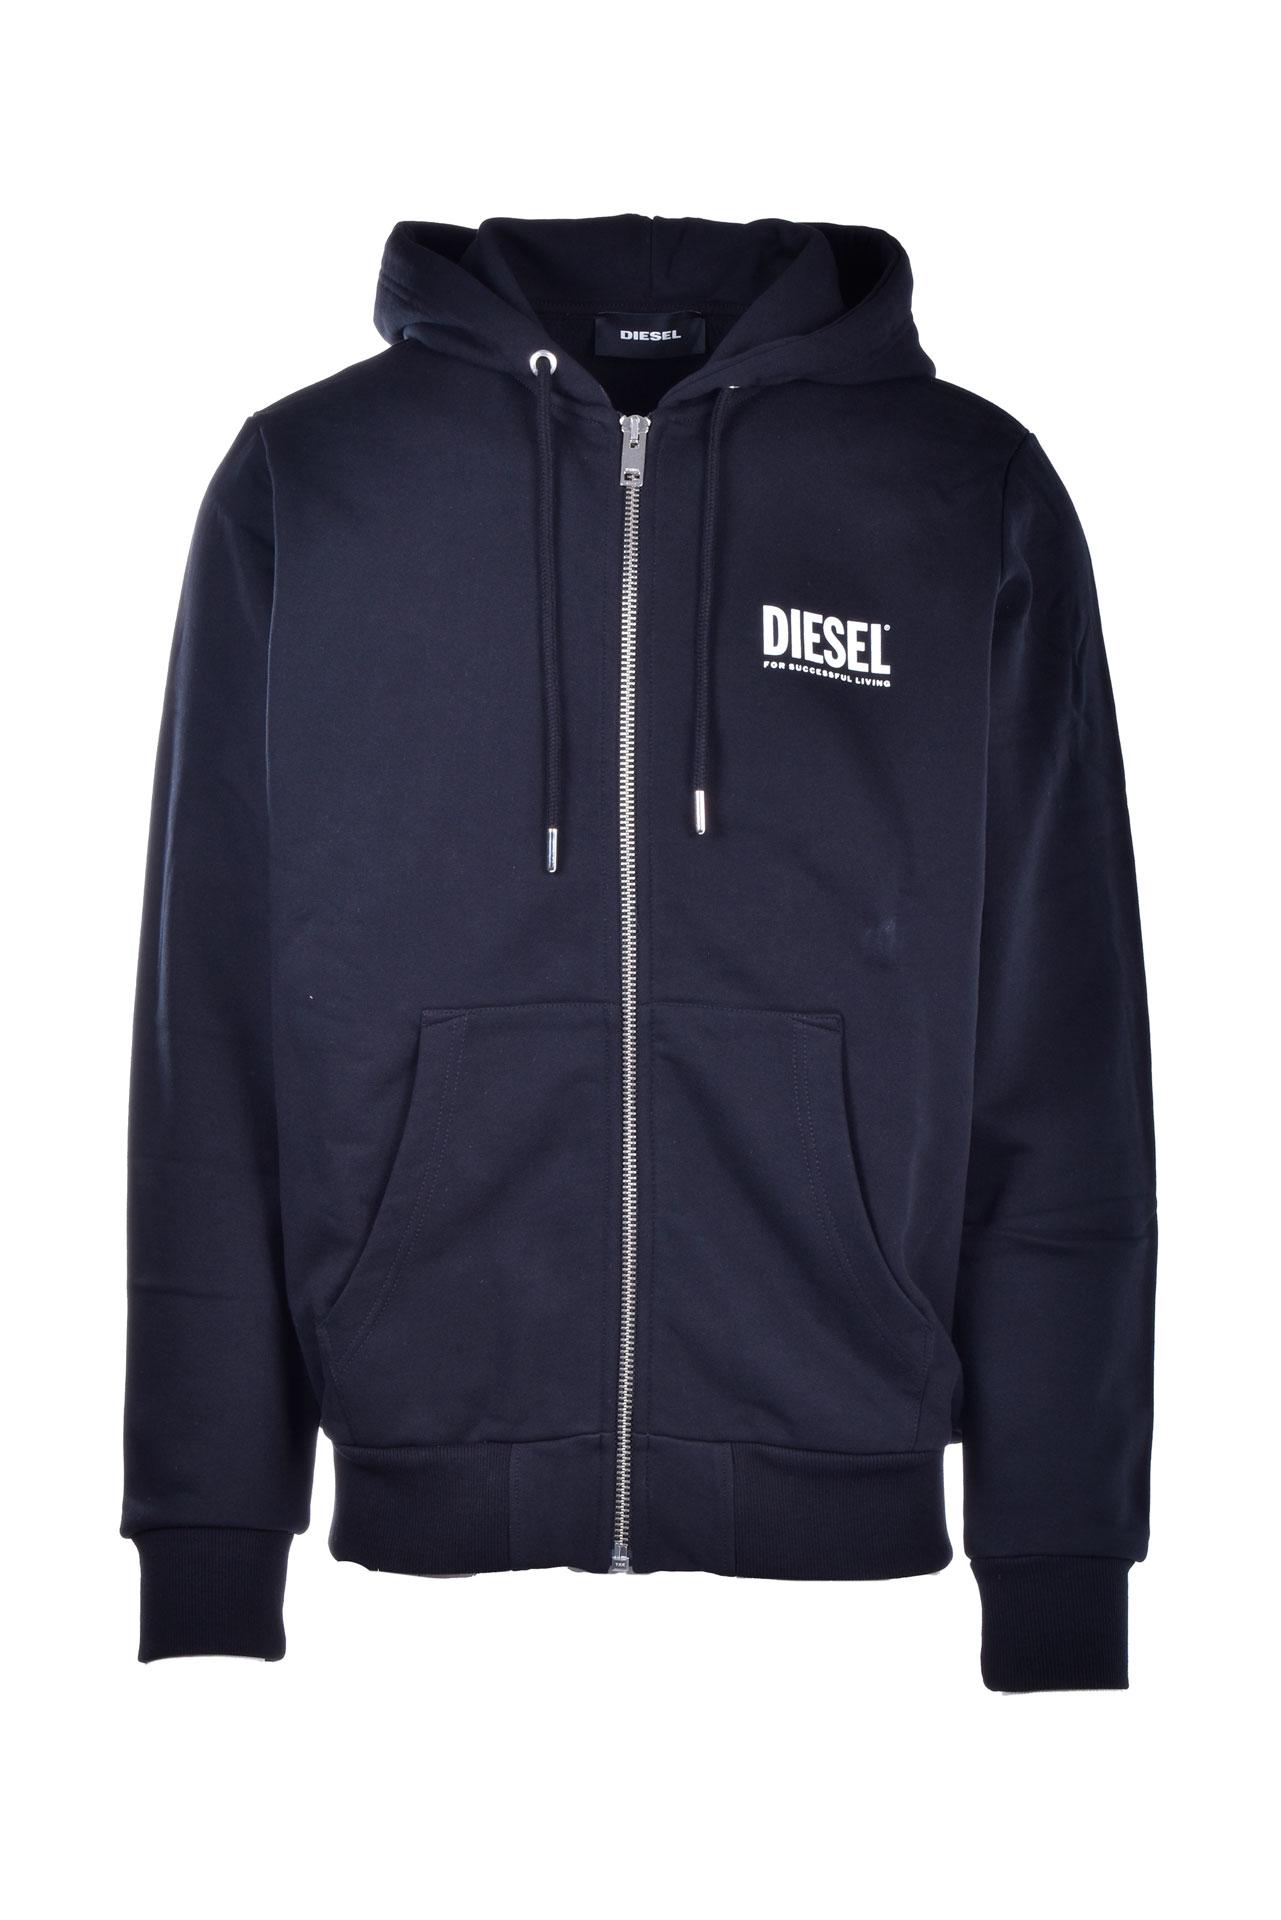 Sweatshirt with zip and hood with logo prints DIESEL | Sweatshirt | 00SAV1 0BAWT900